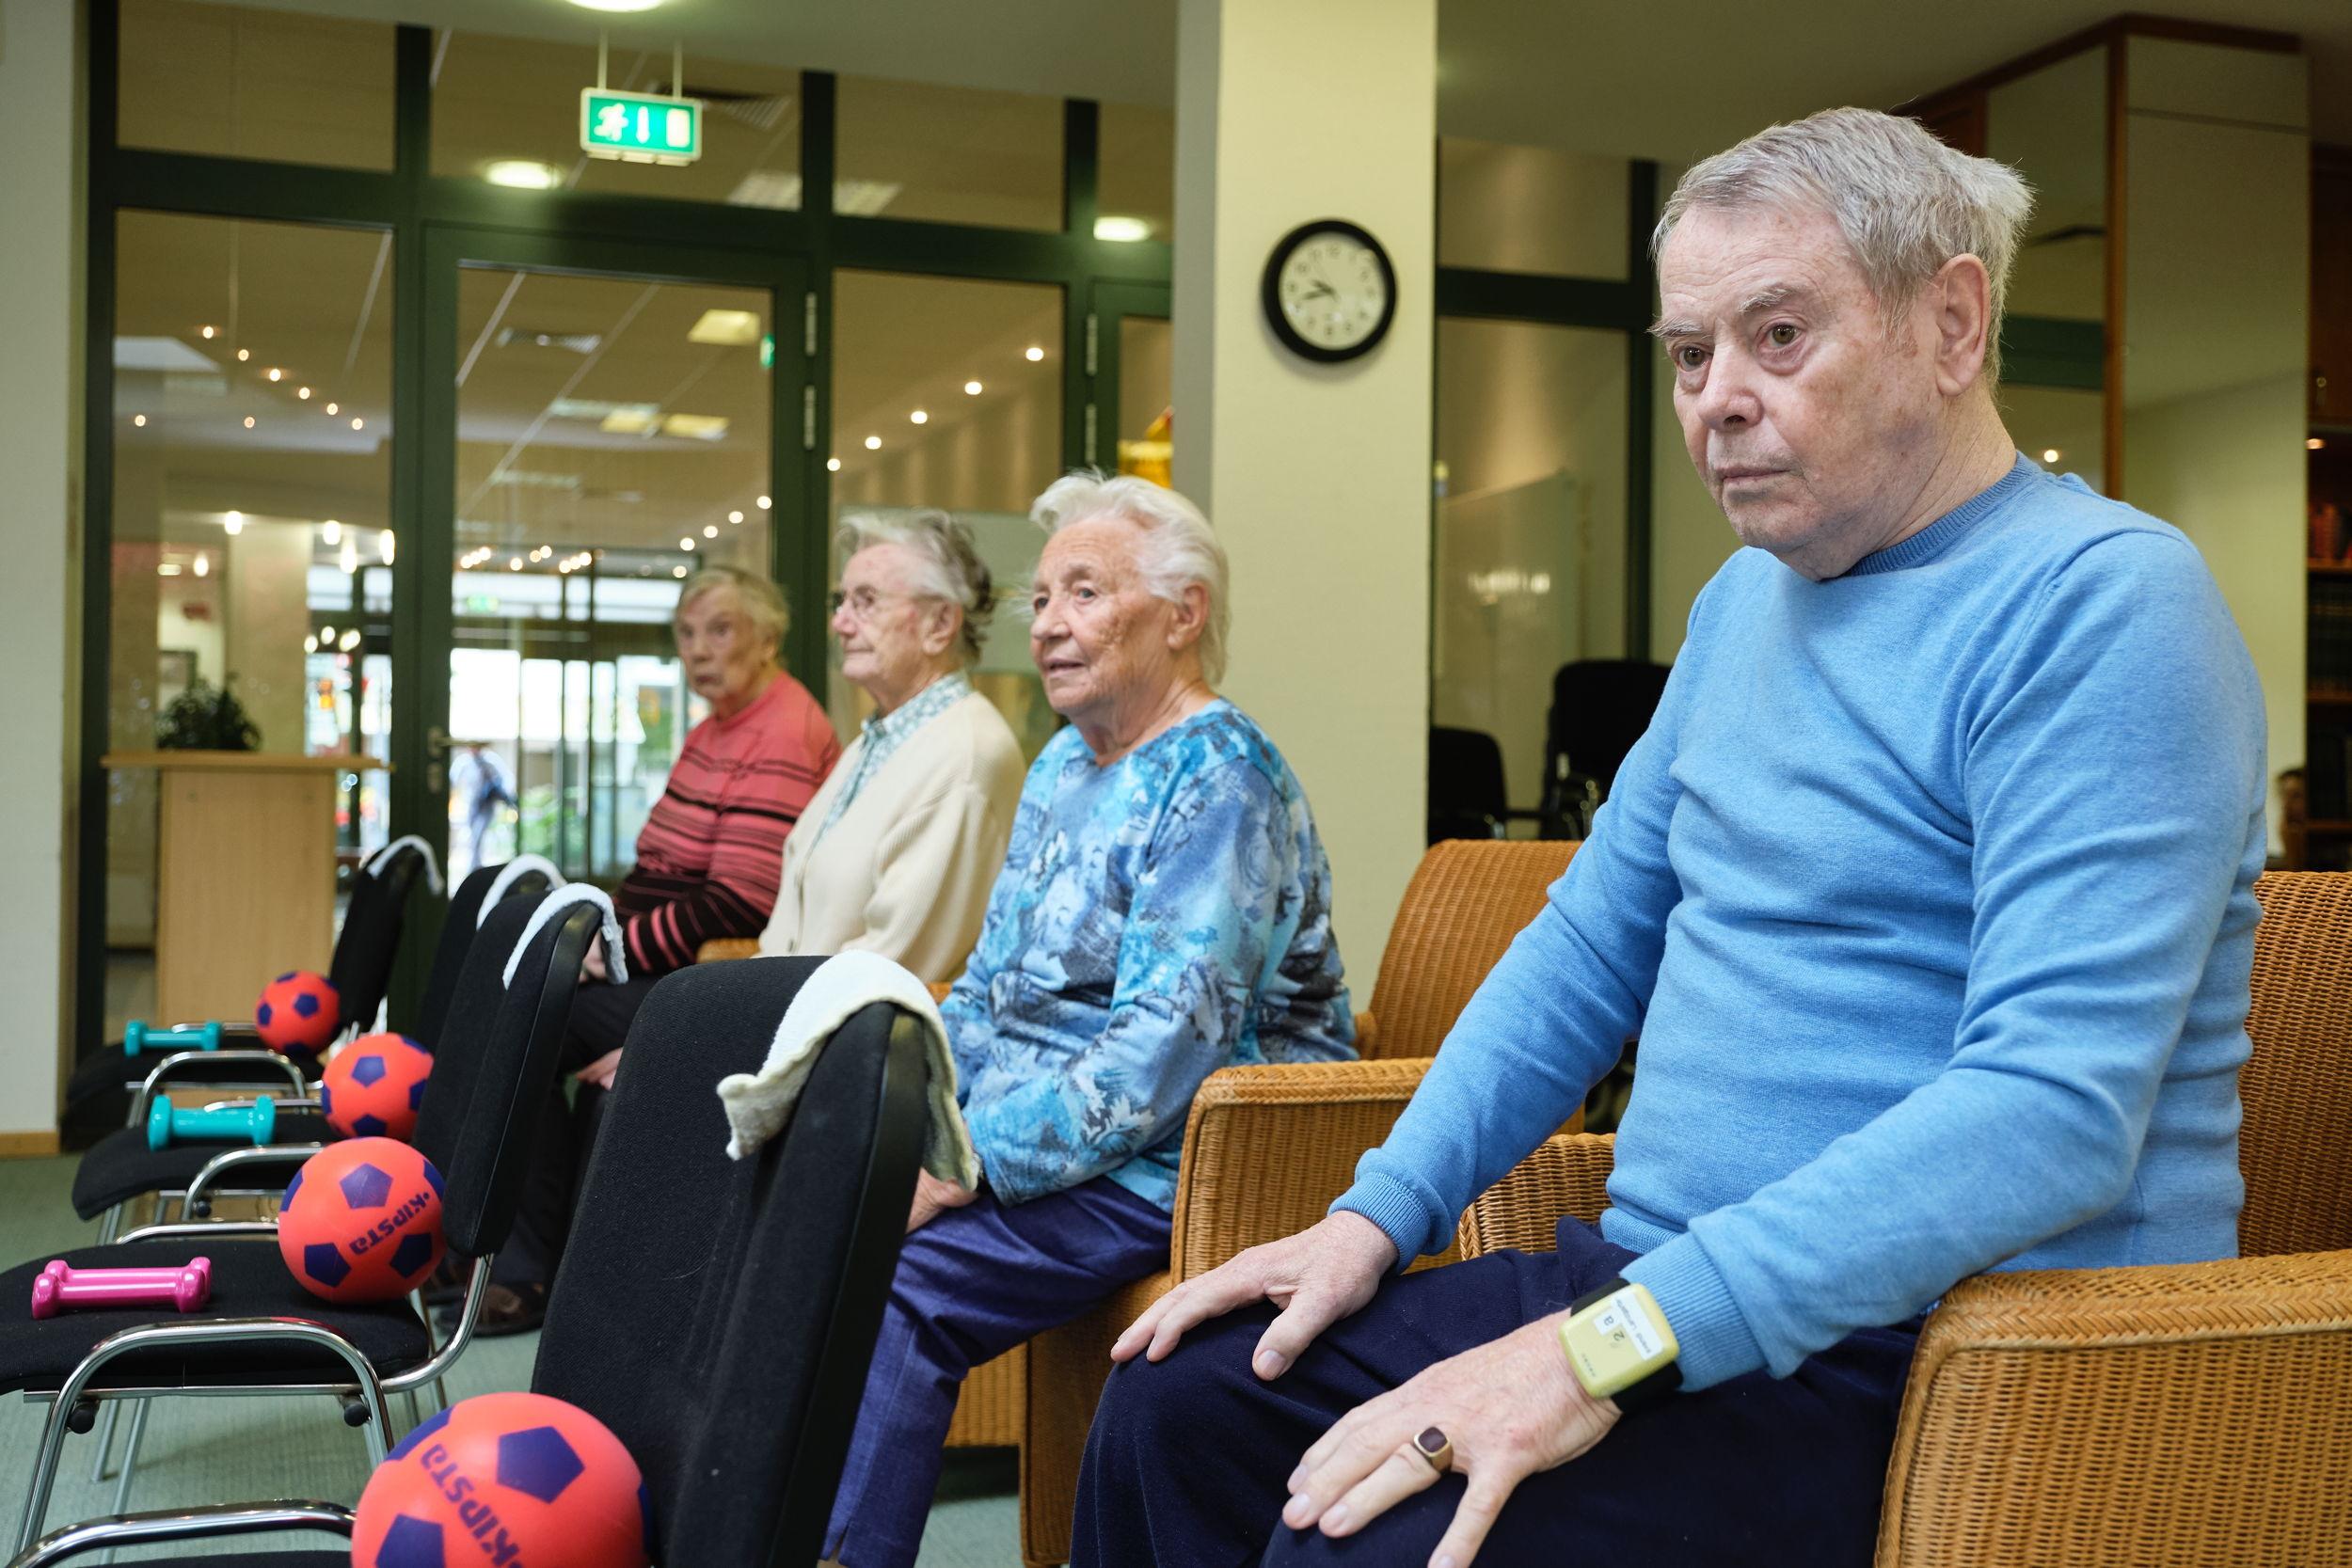 Bewohner bei Gymnastik